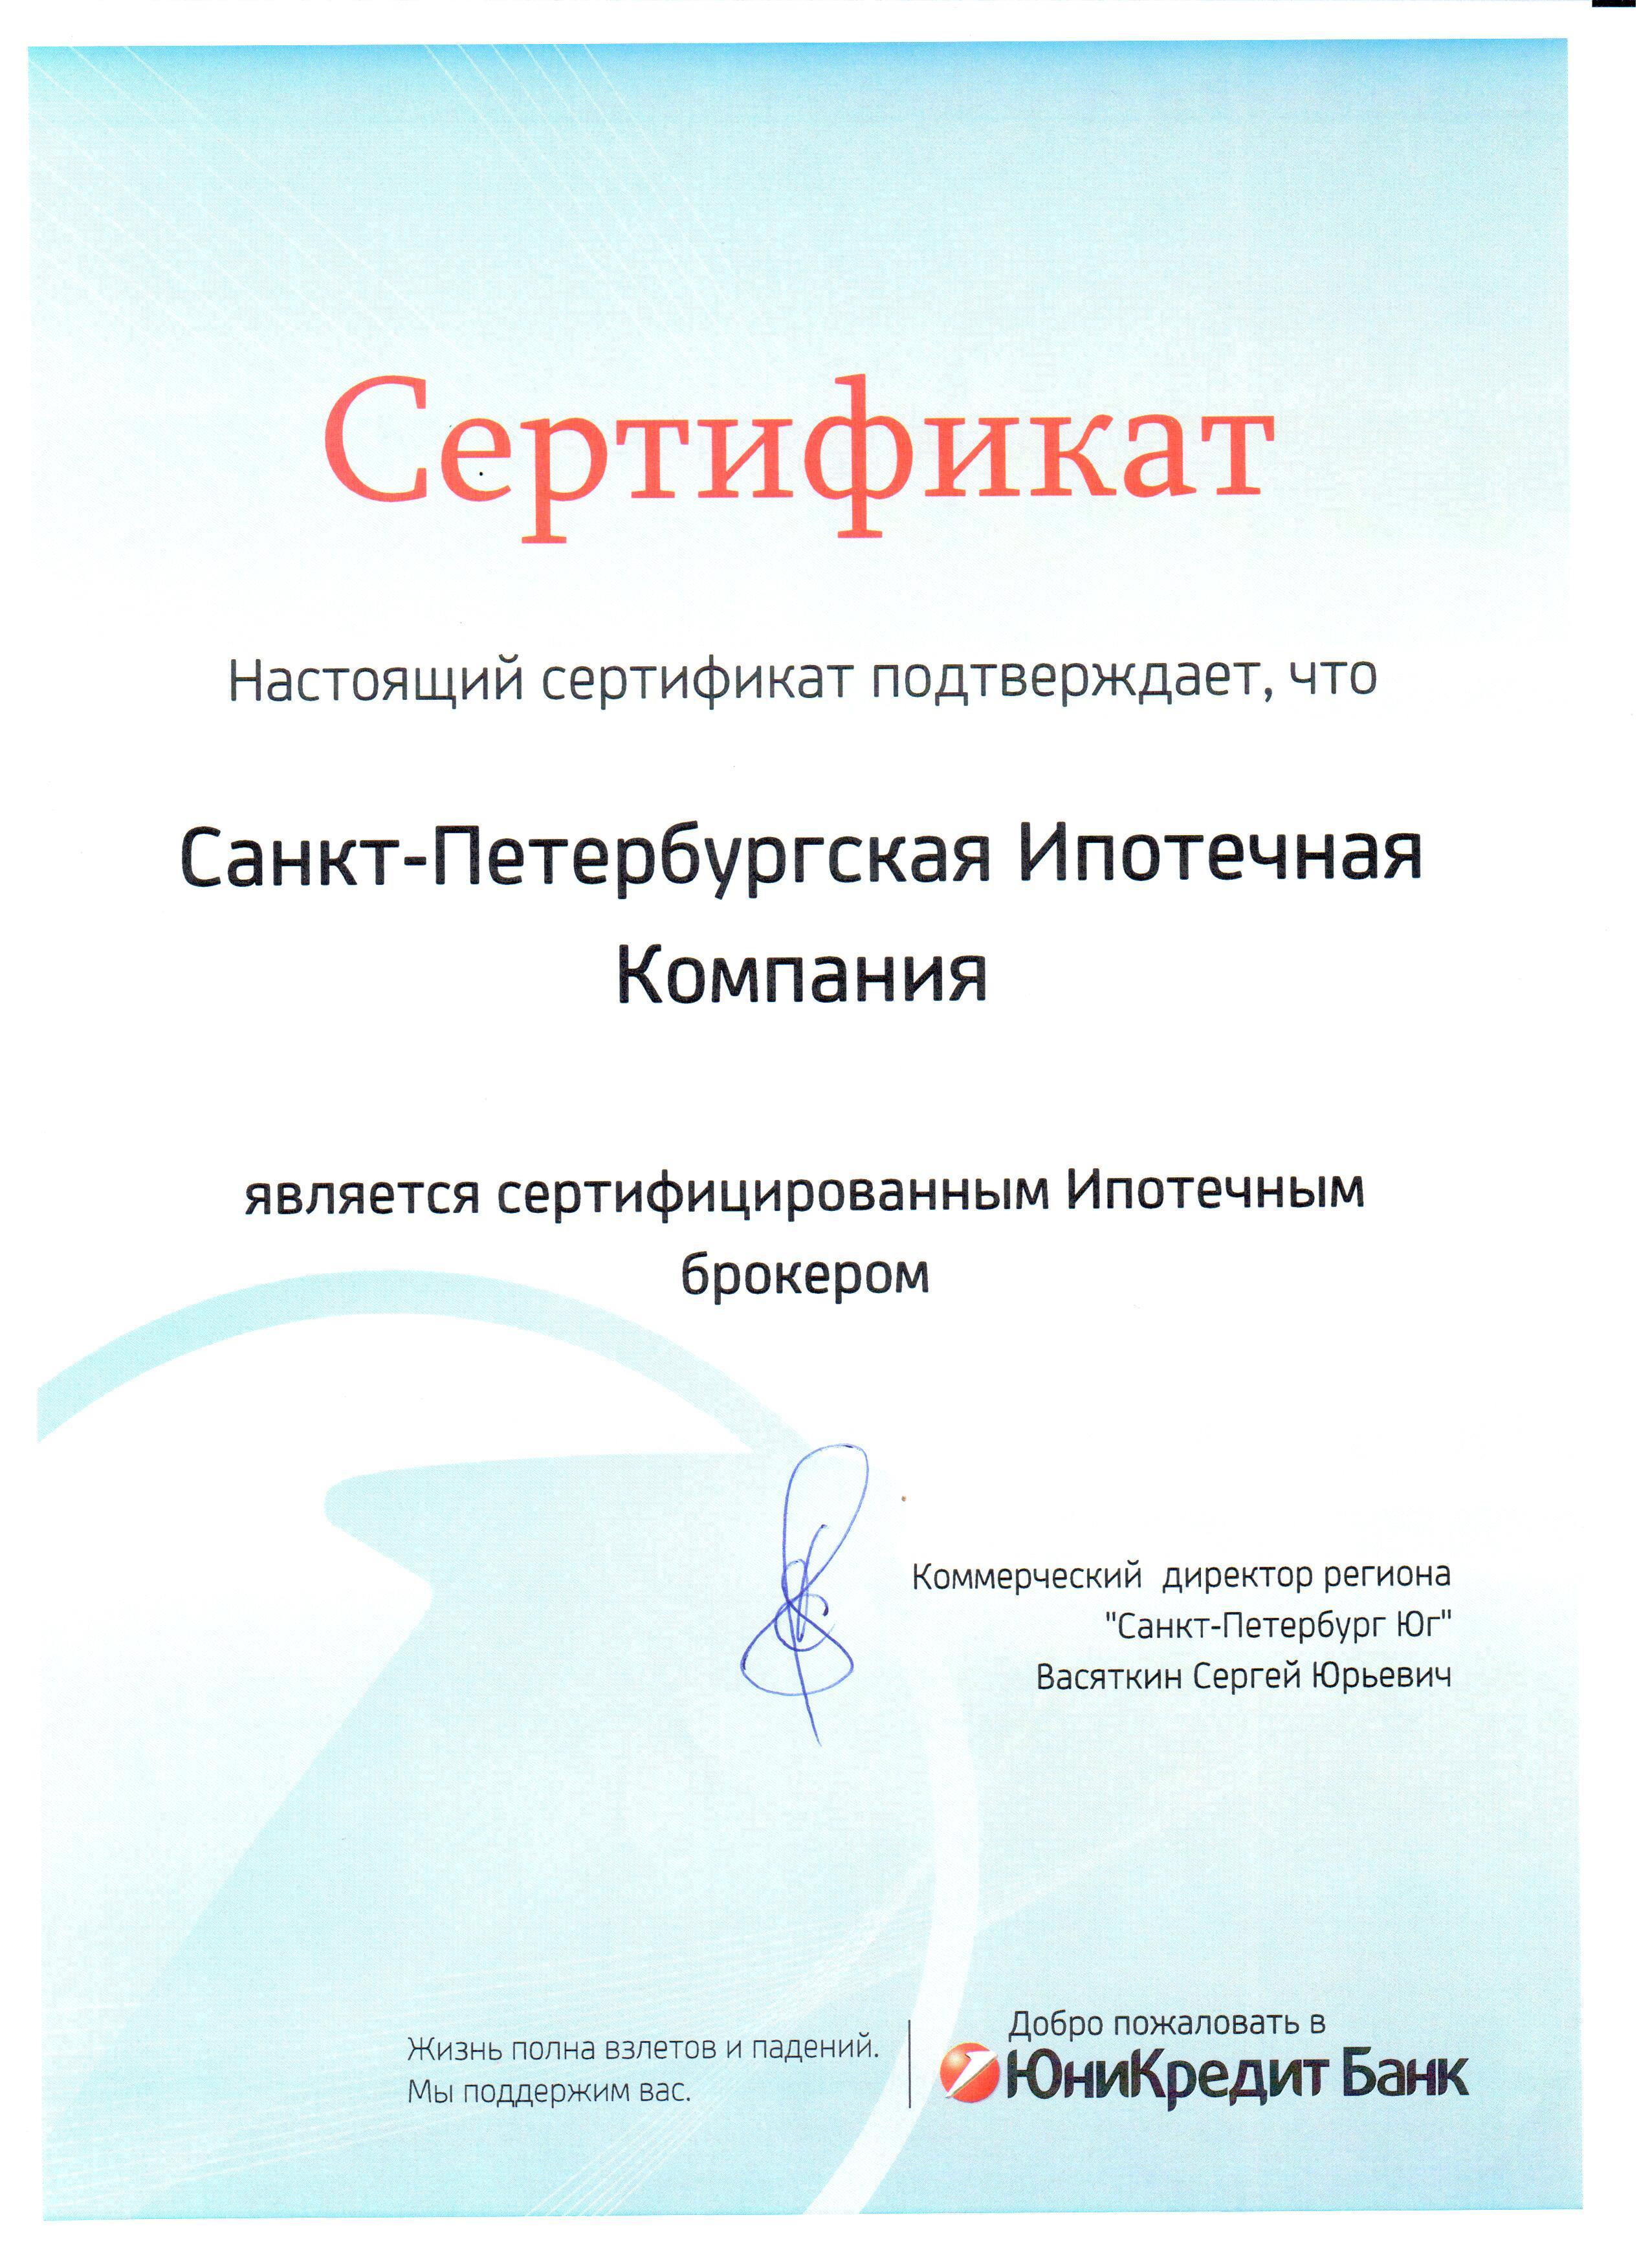 Сертификат ЮниКредит